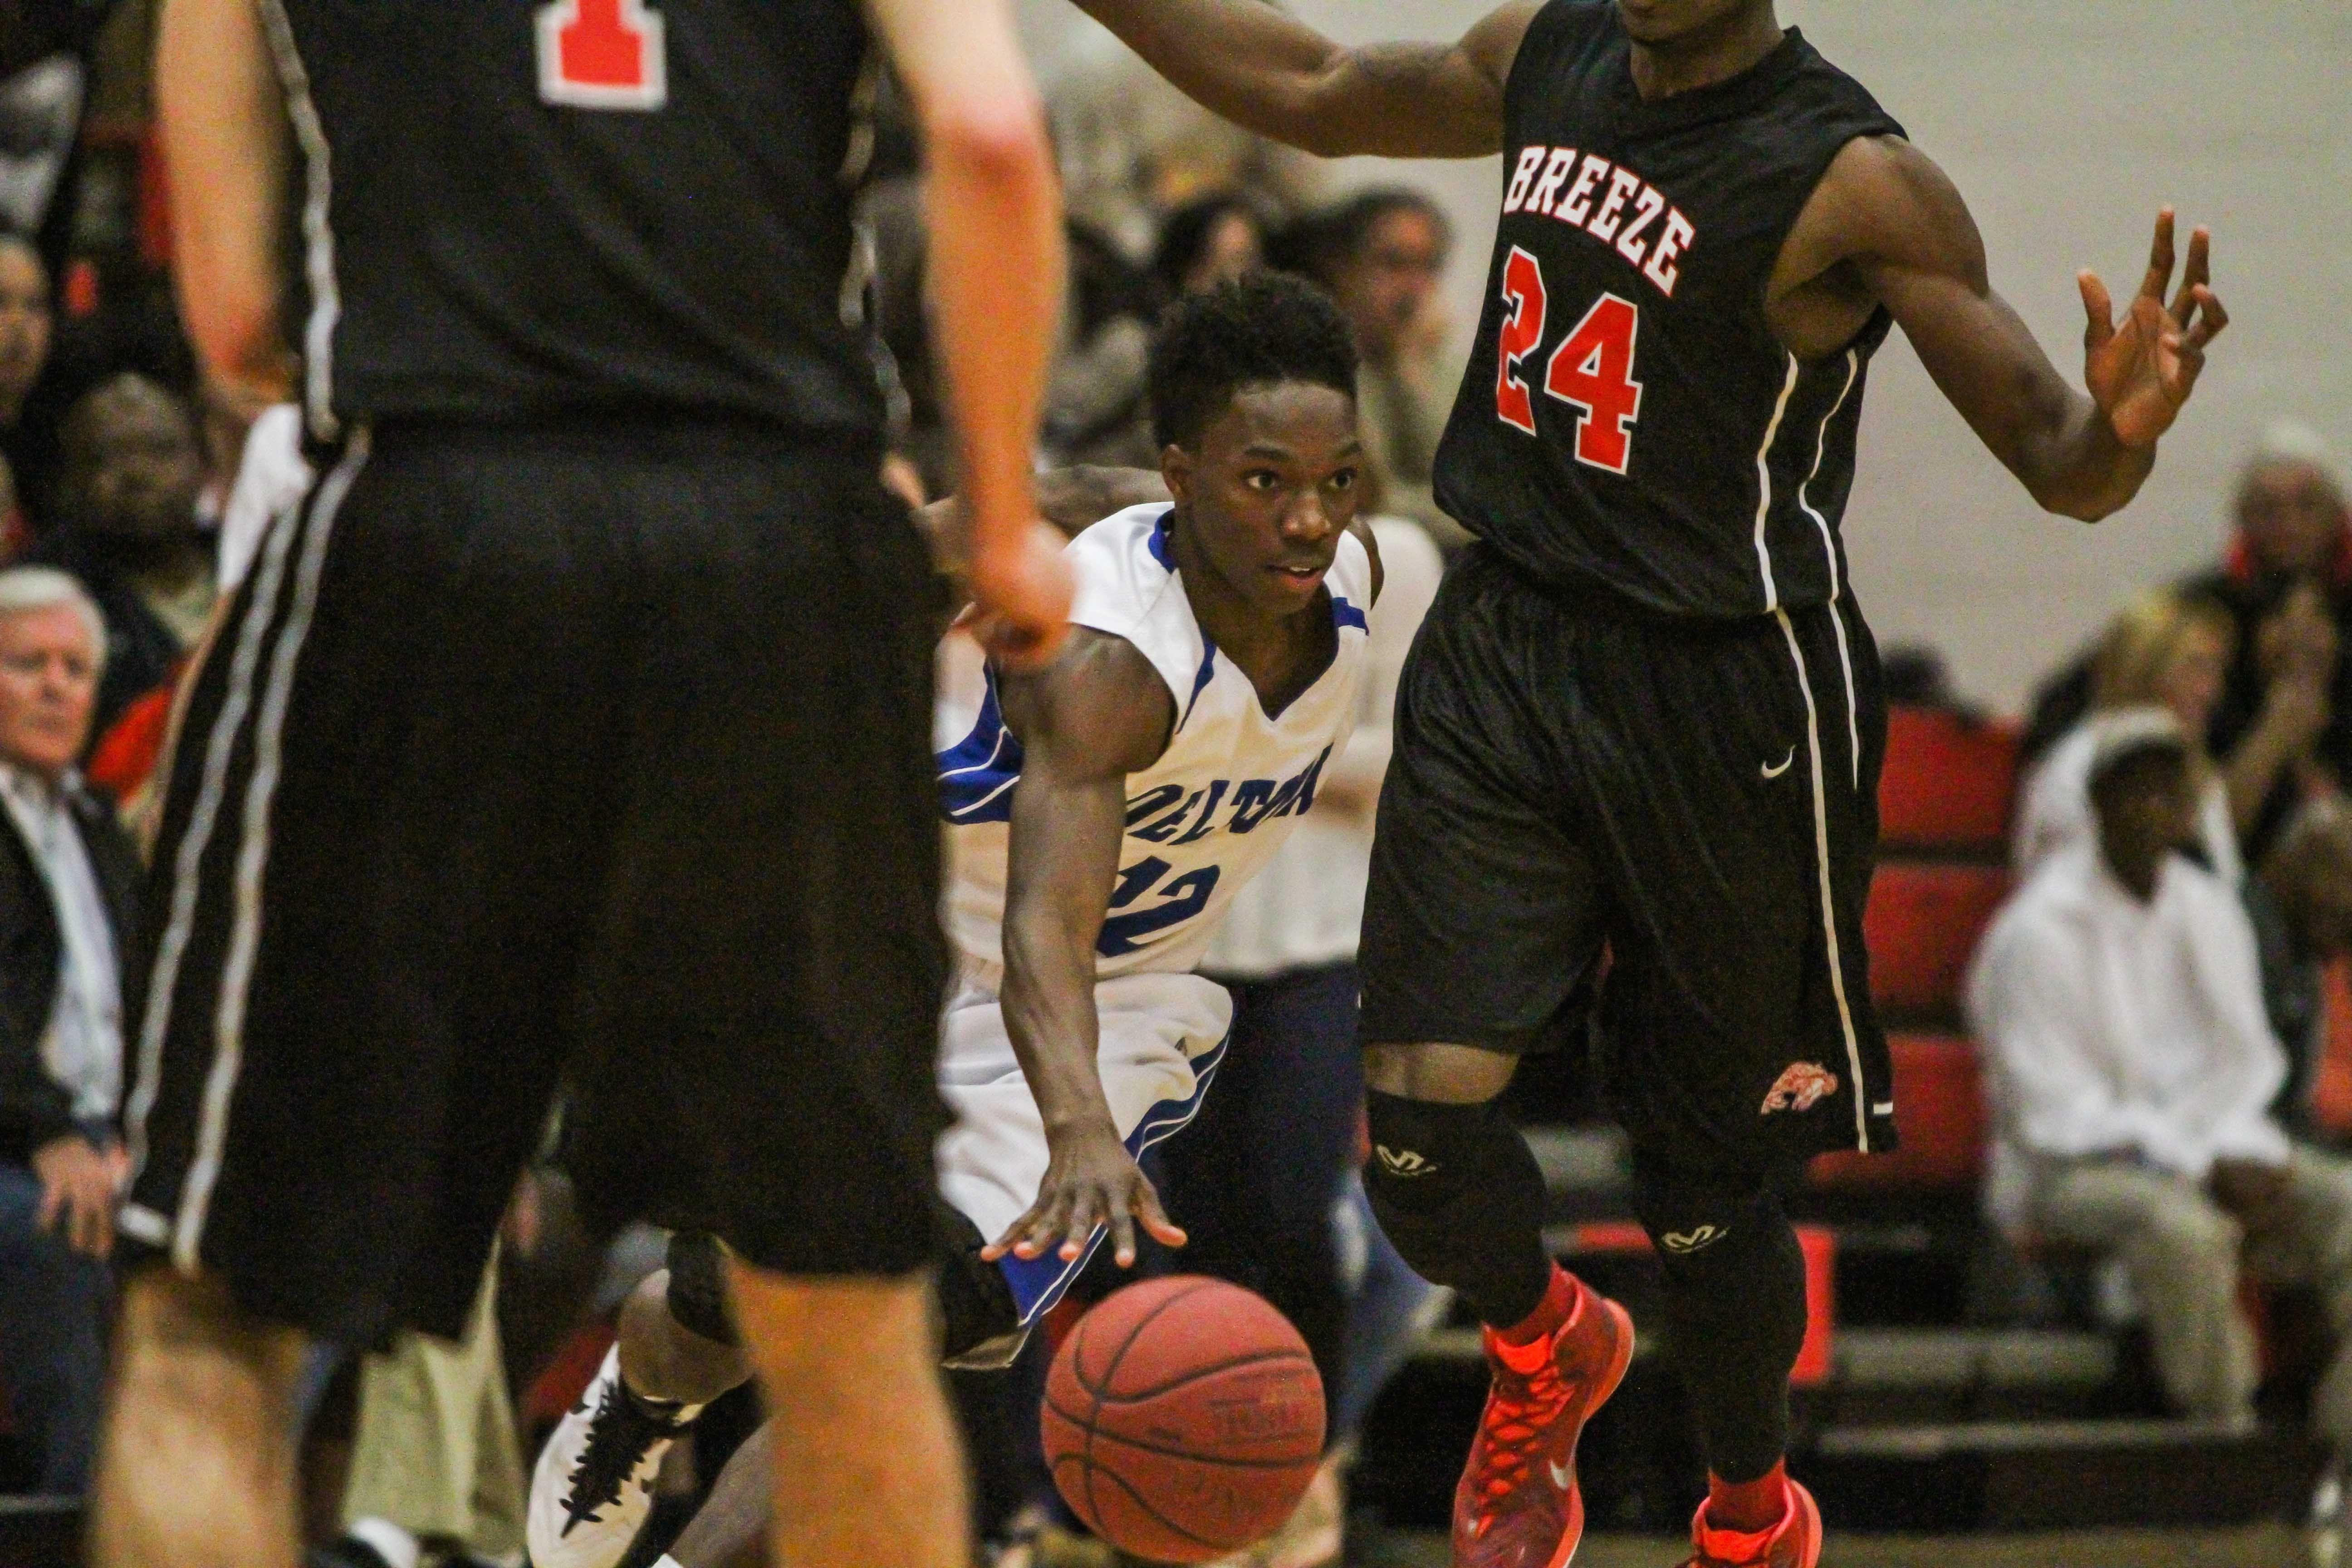 Deltona's Torrey Mayo. High school basketball, Daytona